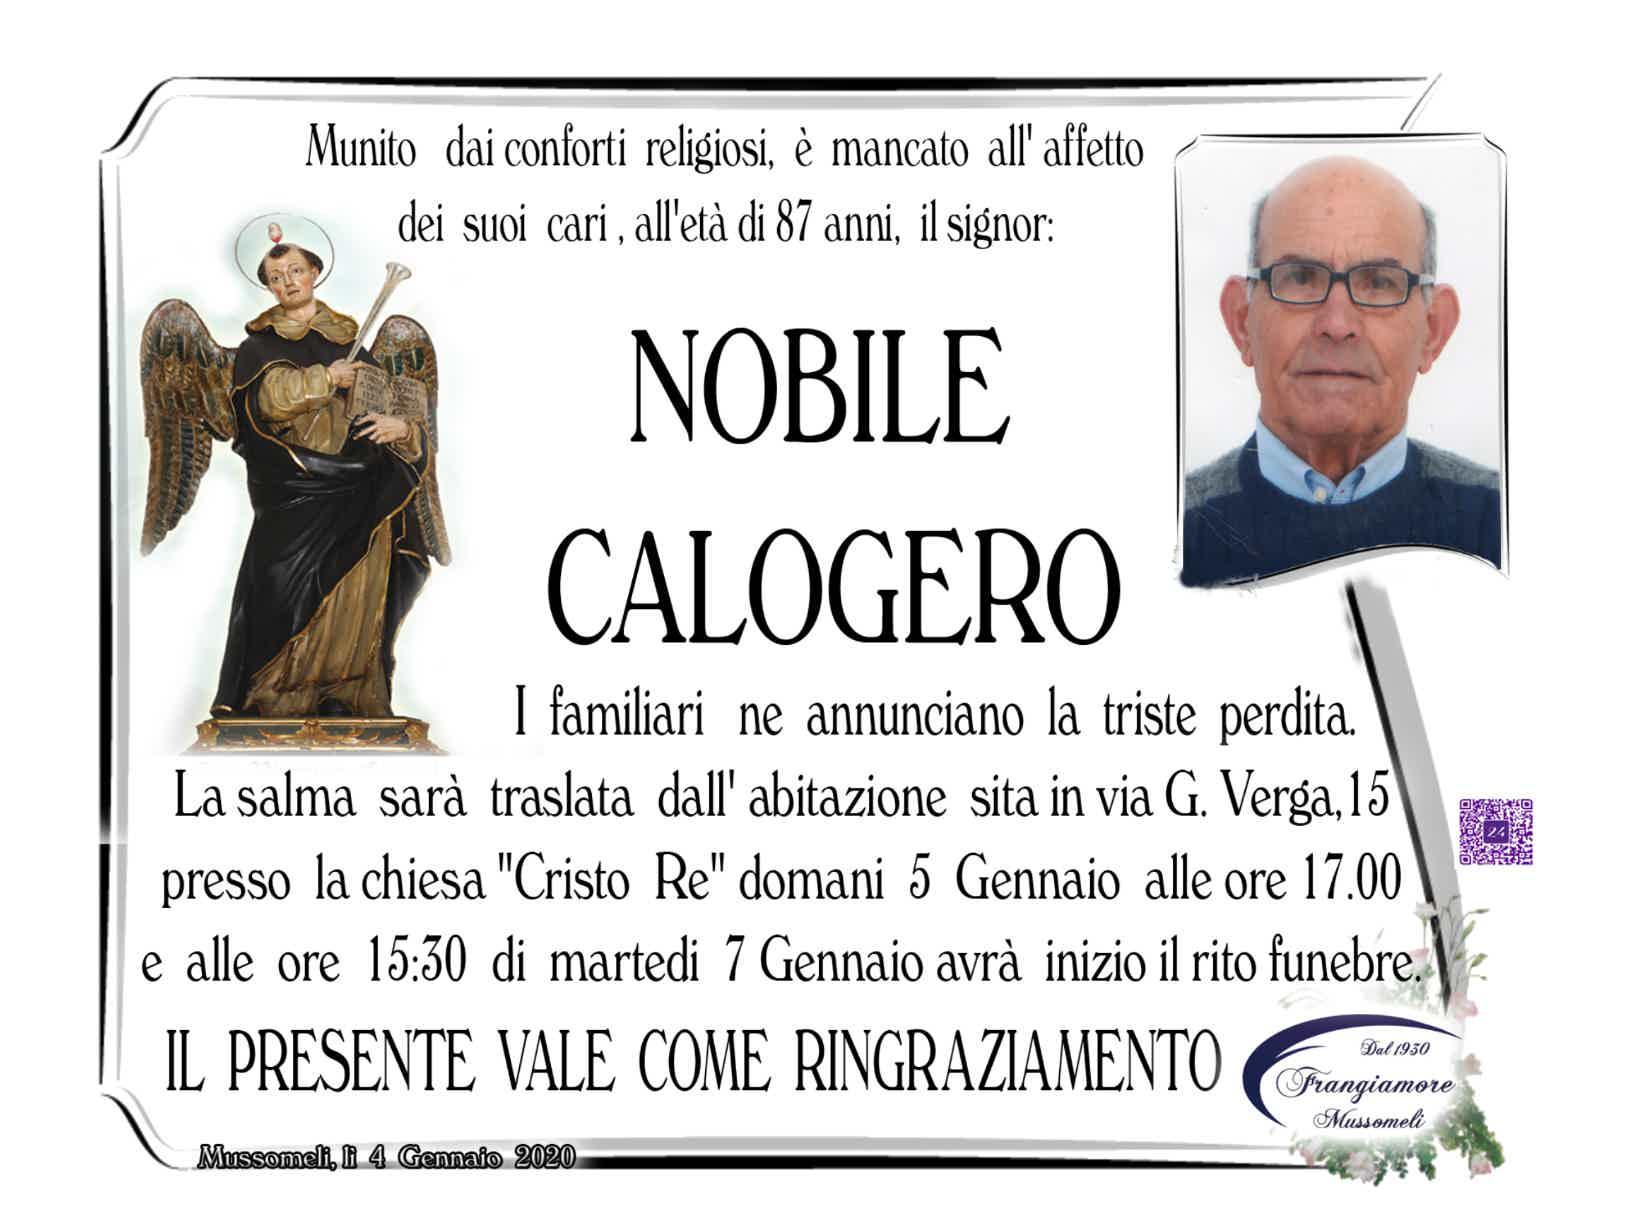 Calogero Nobile